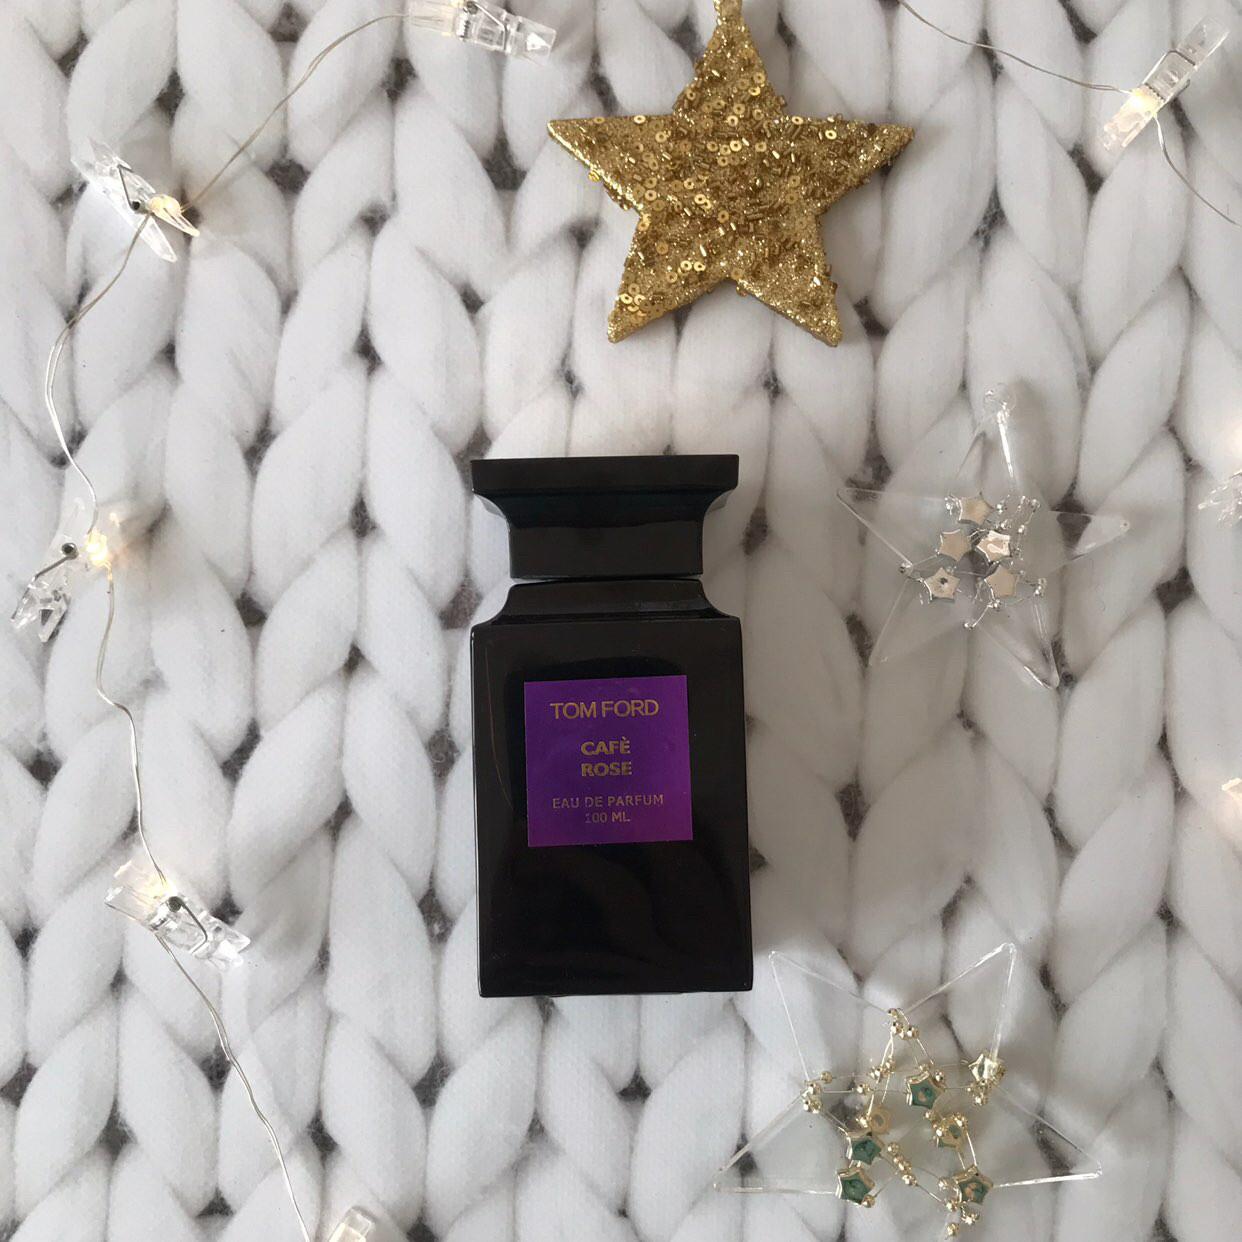 духи Tom Ford Cafe Rose продажа цена в одессе парфюмерия унисекс